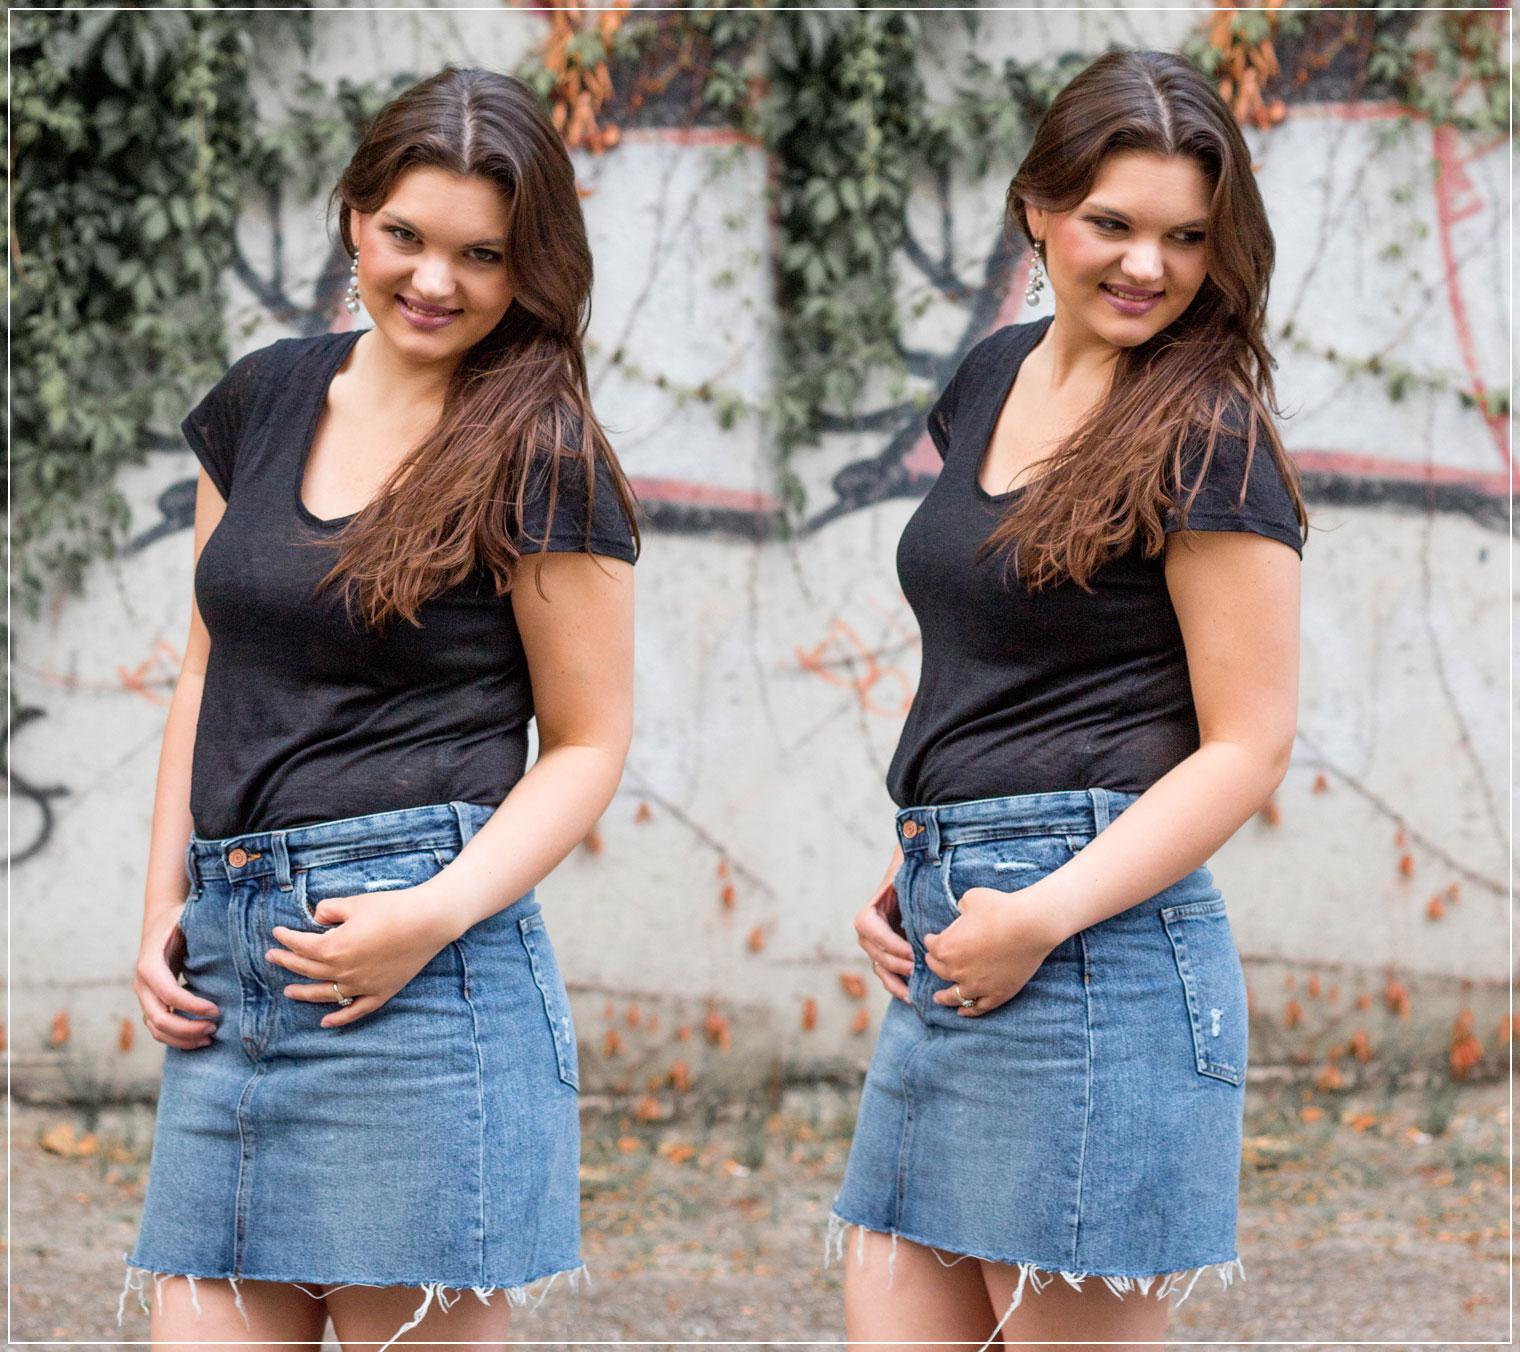 Leinen, Material, Modetrend, Styleguide, Outfitinspiration, Modebloggerin, Fashionbloggerin, Modeblog, Ruhrgebiet